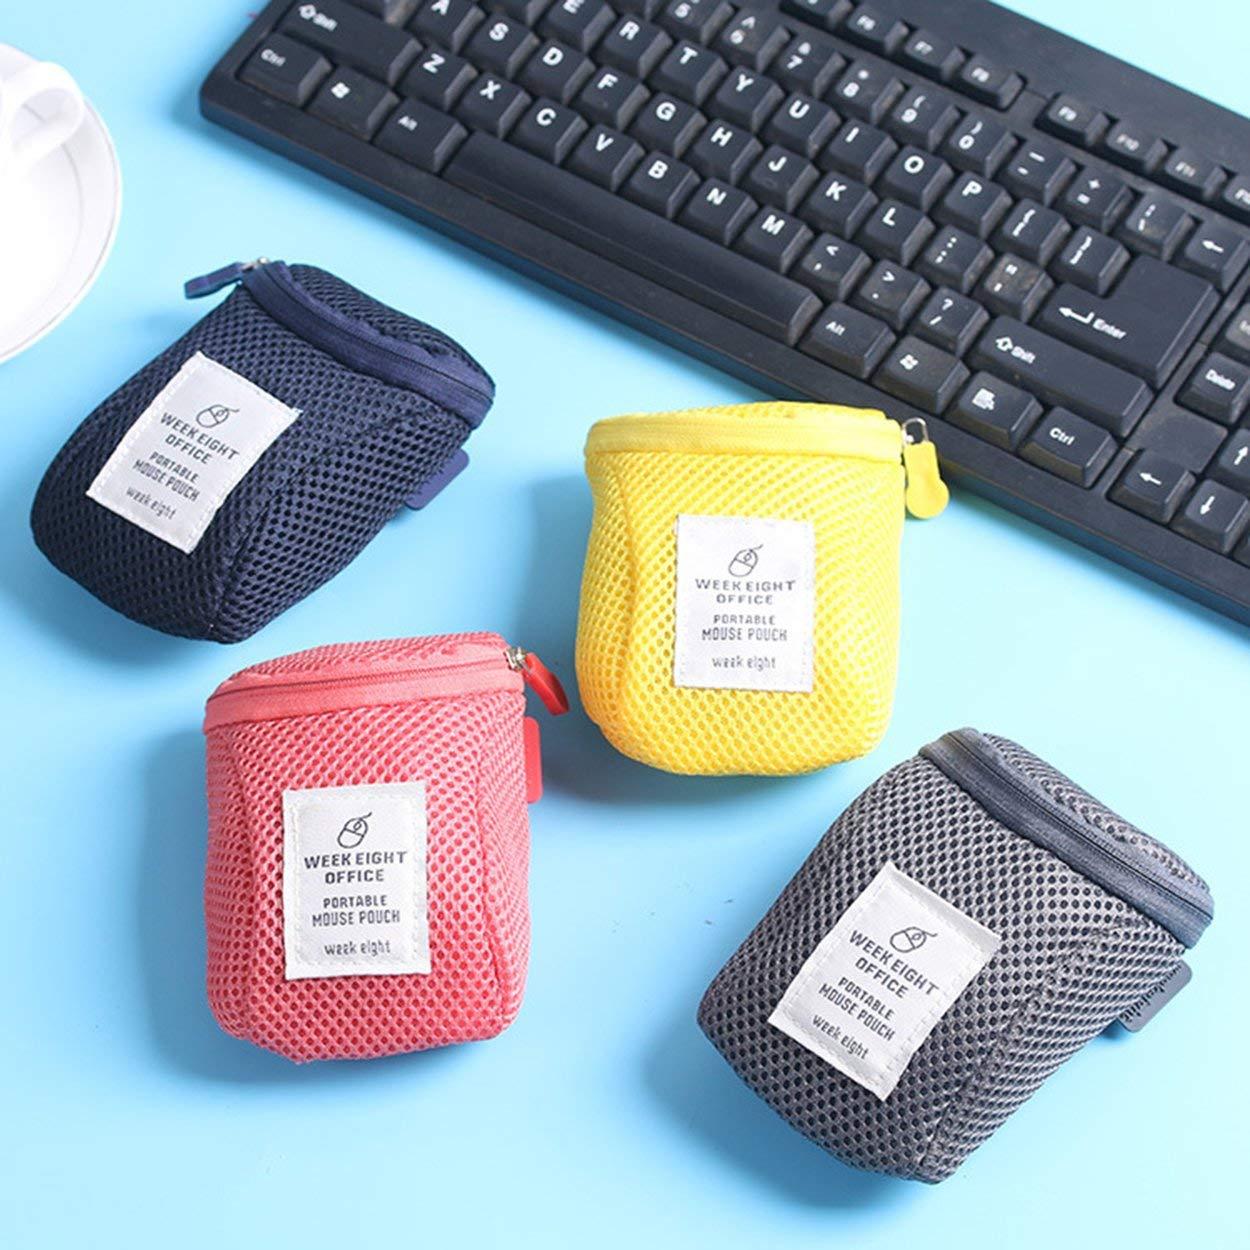 Lorenlli Accesorios para mouse Mini bolsa de almacenamiento a prueba de choques port/átil Dispositivos de dispositivos digitales personalizados Cable USB Auricular Organizador de bolsa